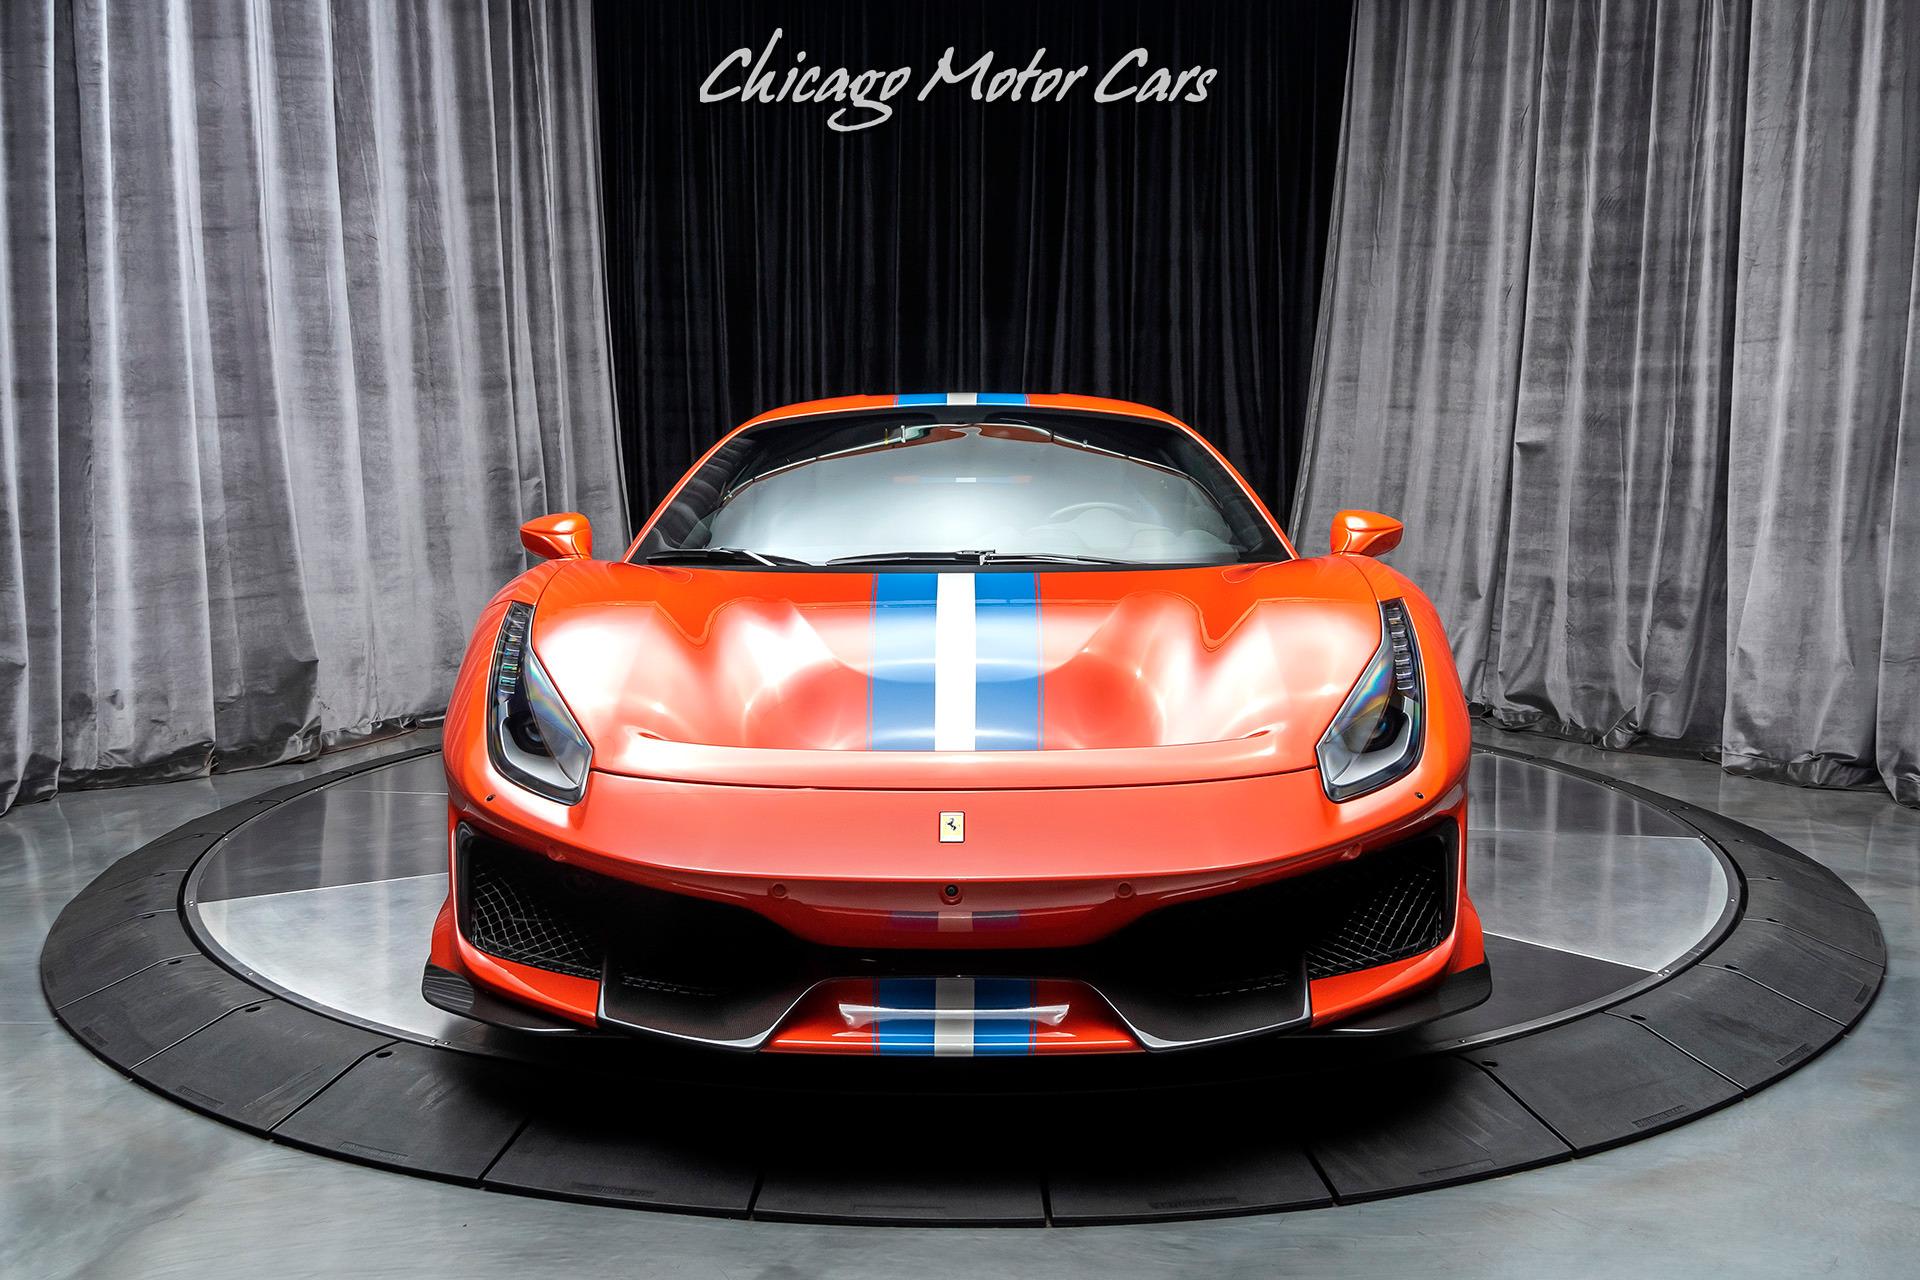 For Sale 2019 Ferrari 488 Pista Chicago Motor Cars United States For Sale On Luxurypulse